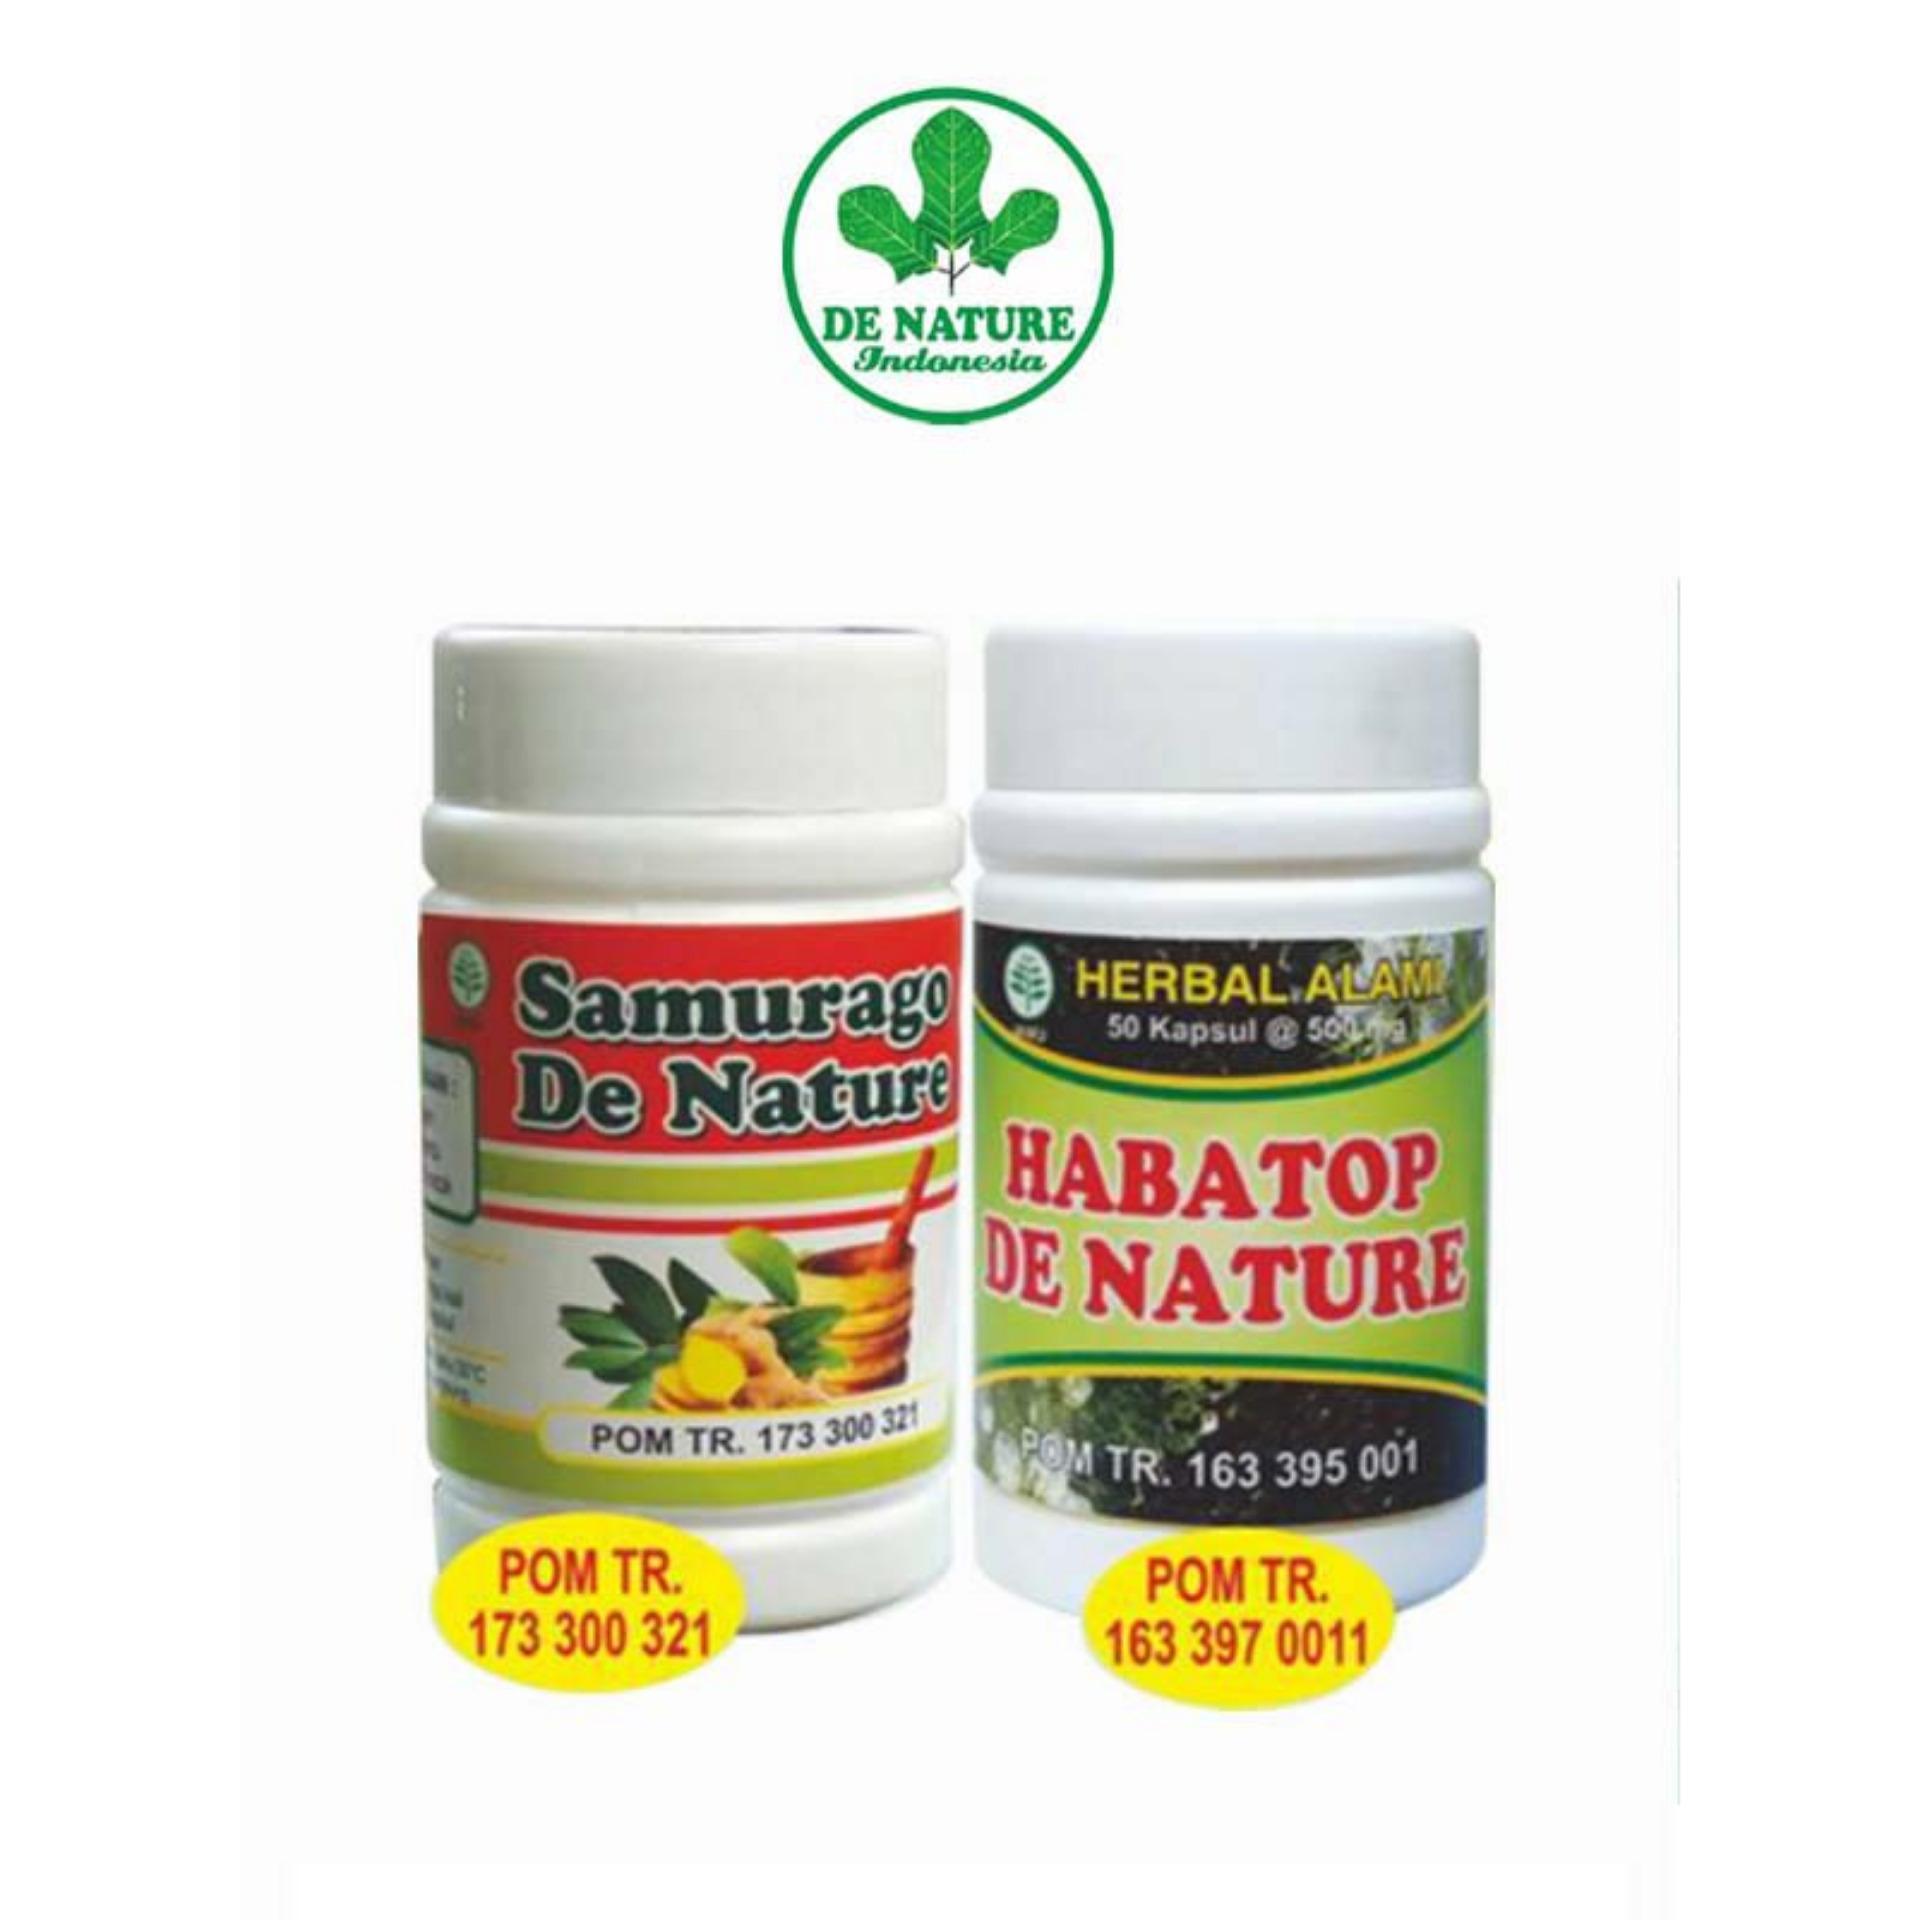 Buy Sell Cheapest Obat Samurago De Best Quality Product Deals Asam Urat Rematik Denature Herbal Habatop Asli Nature